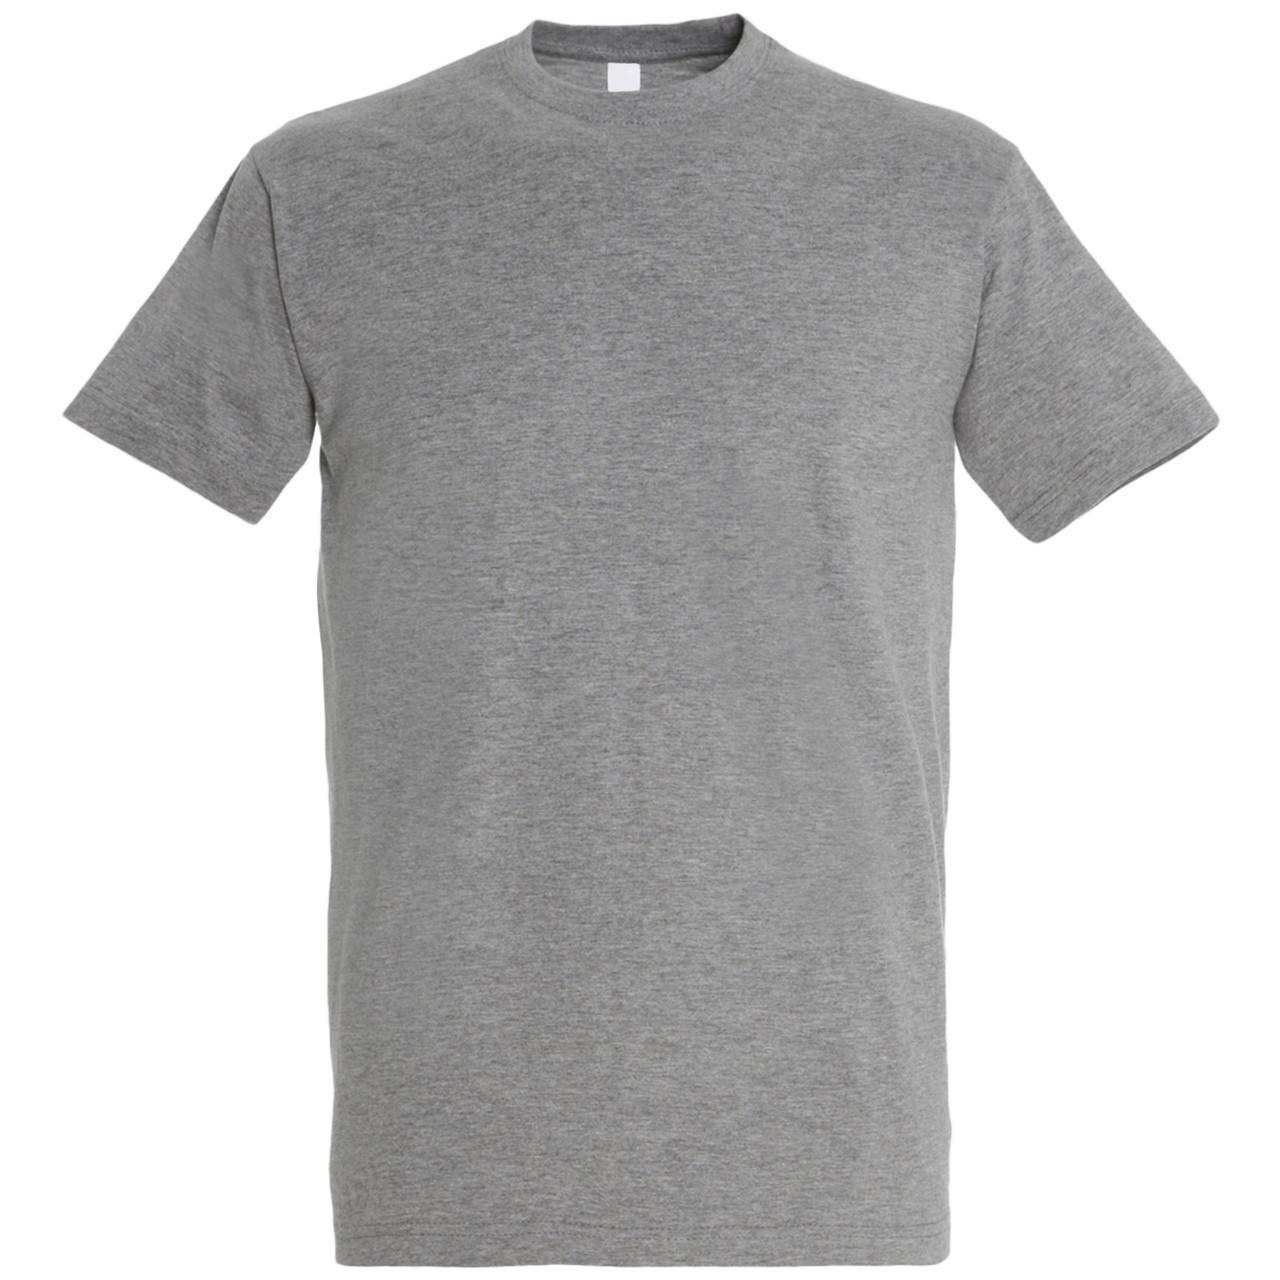 Oднотонная футболка | Серый меланж | 160 гр. | M